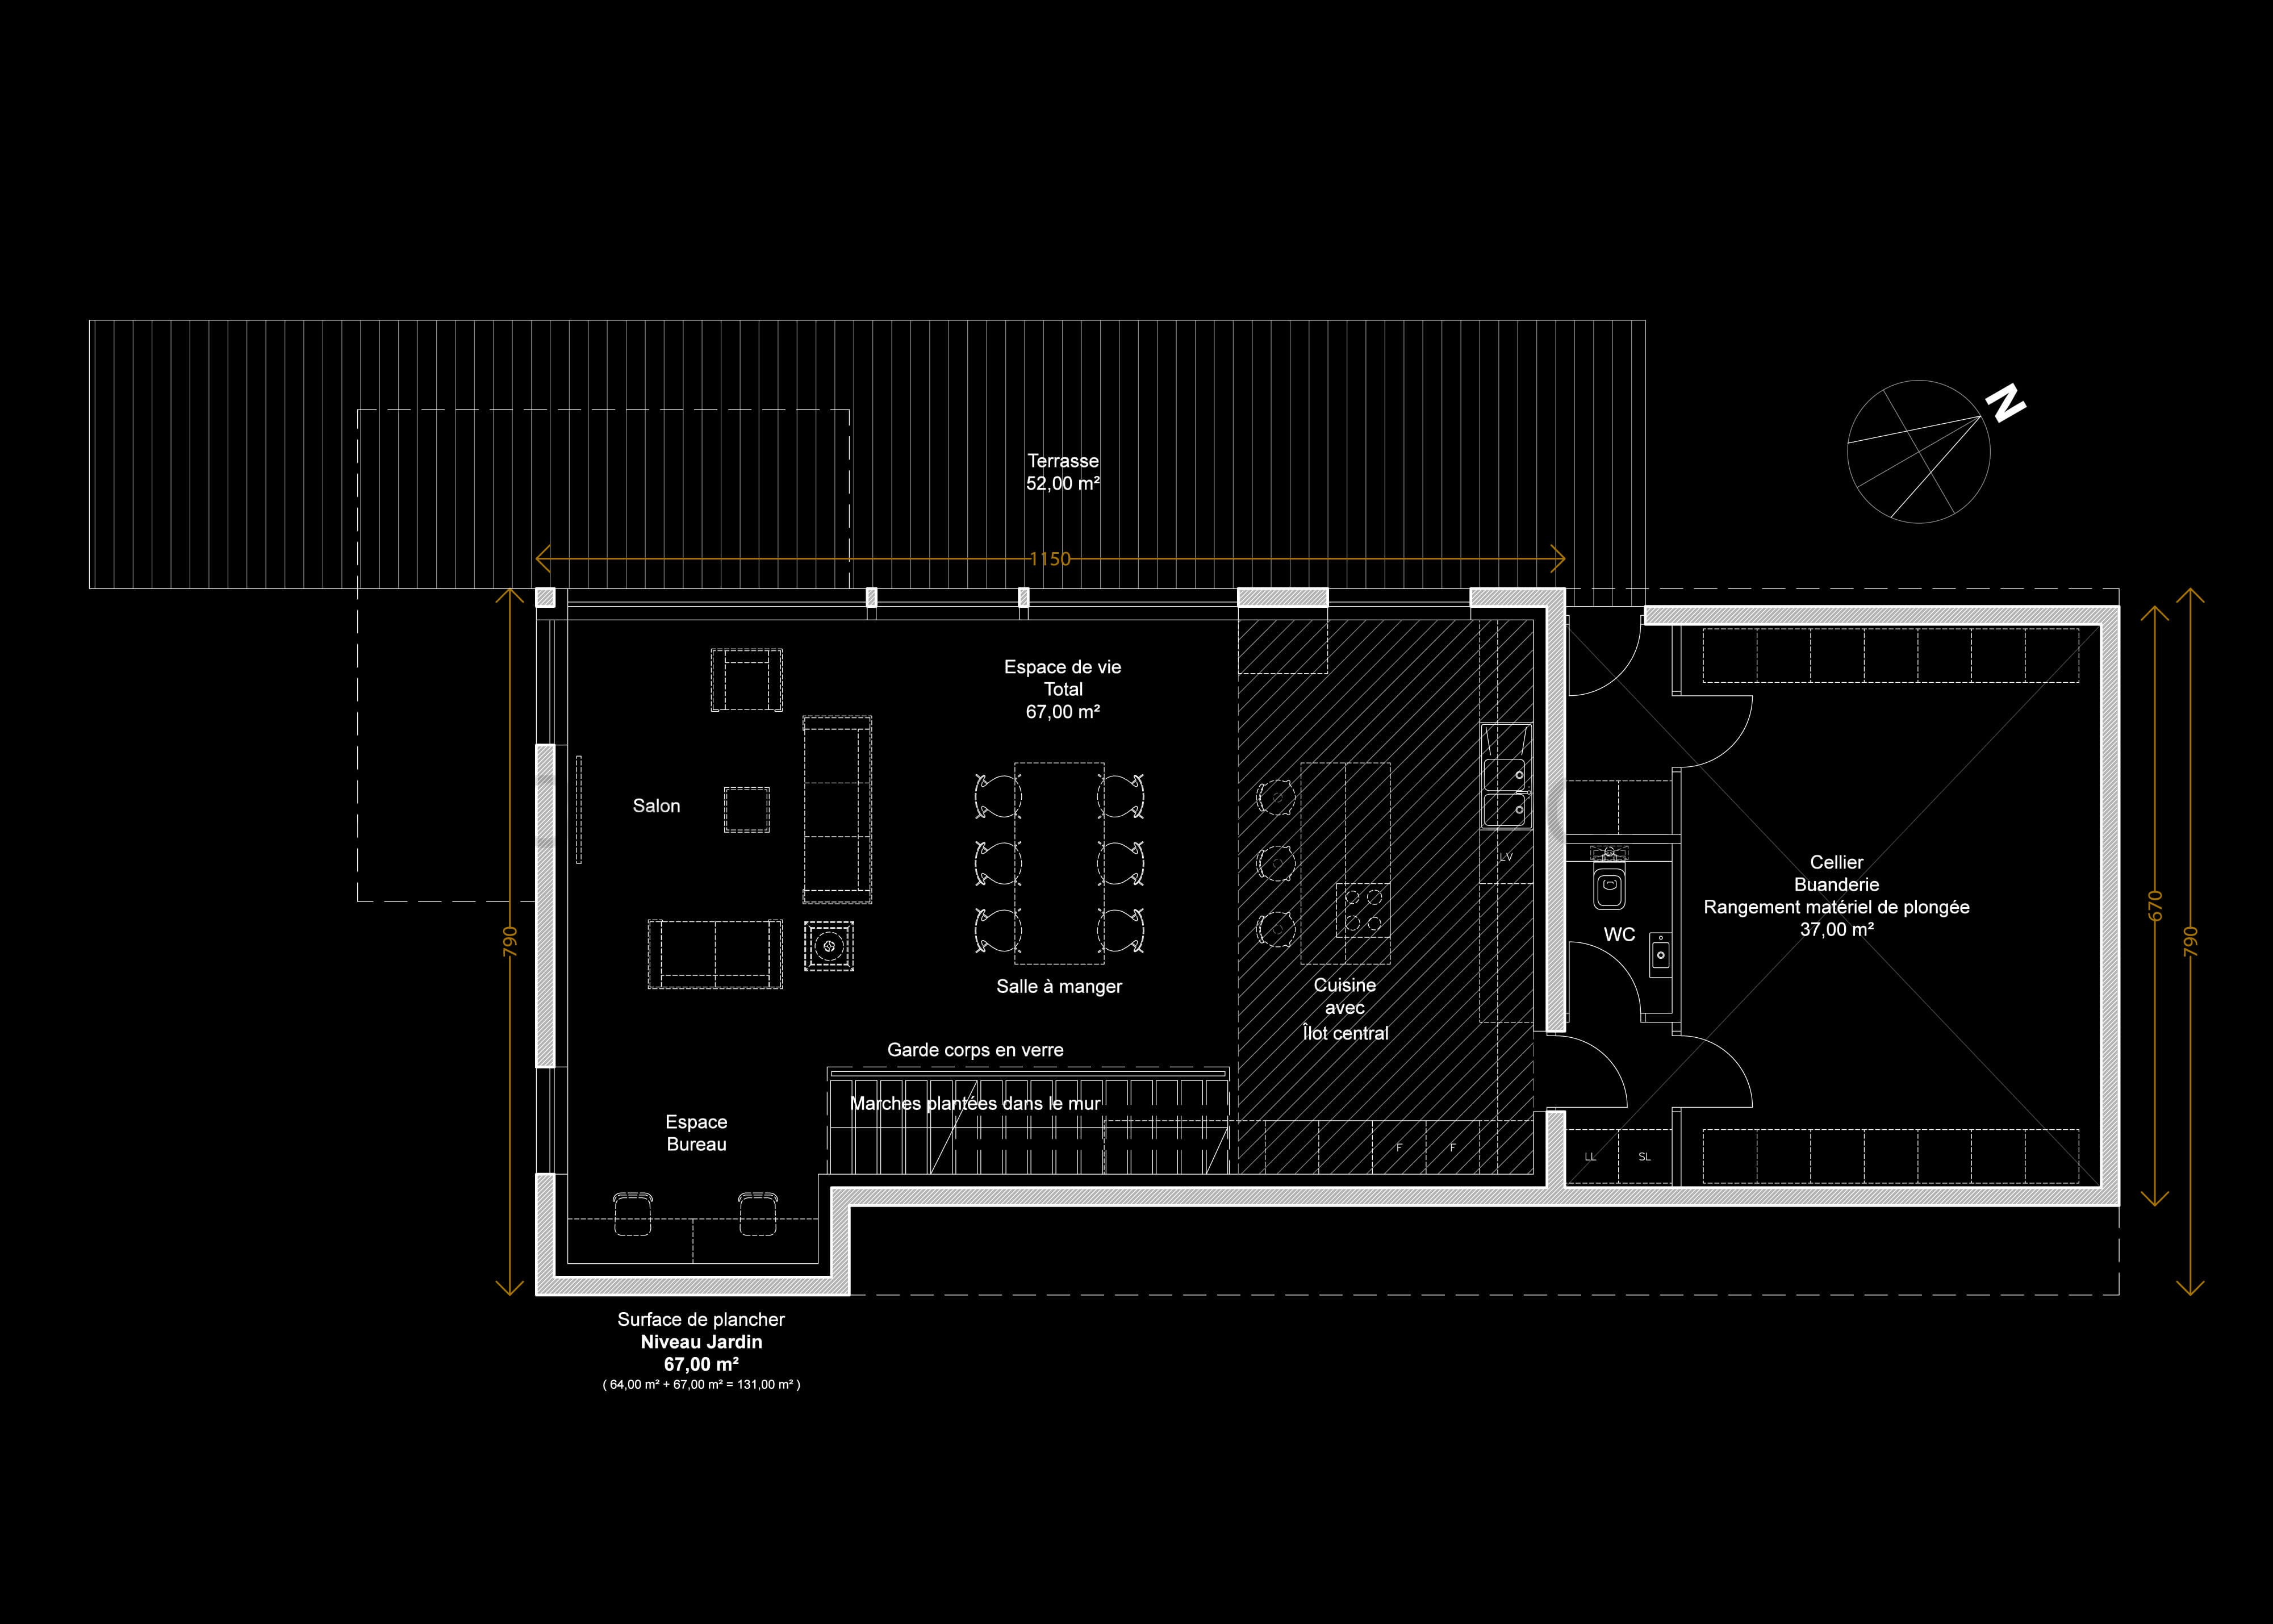 2017 02 02 (2016-007) PROJET 1 - 003 - Plan du niveau jardin